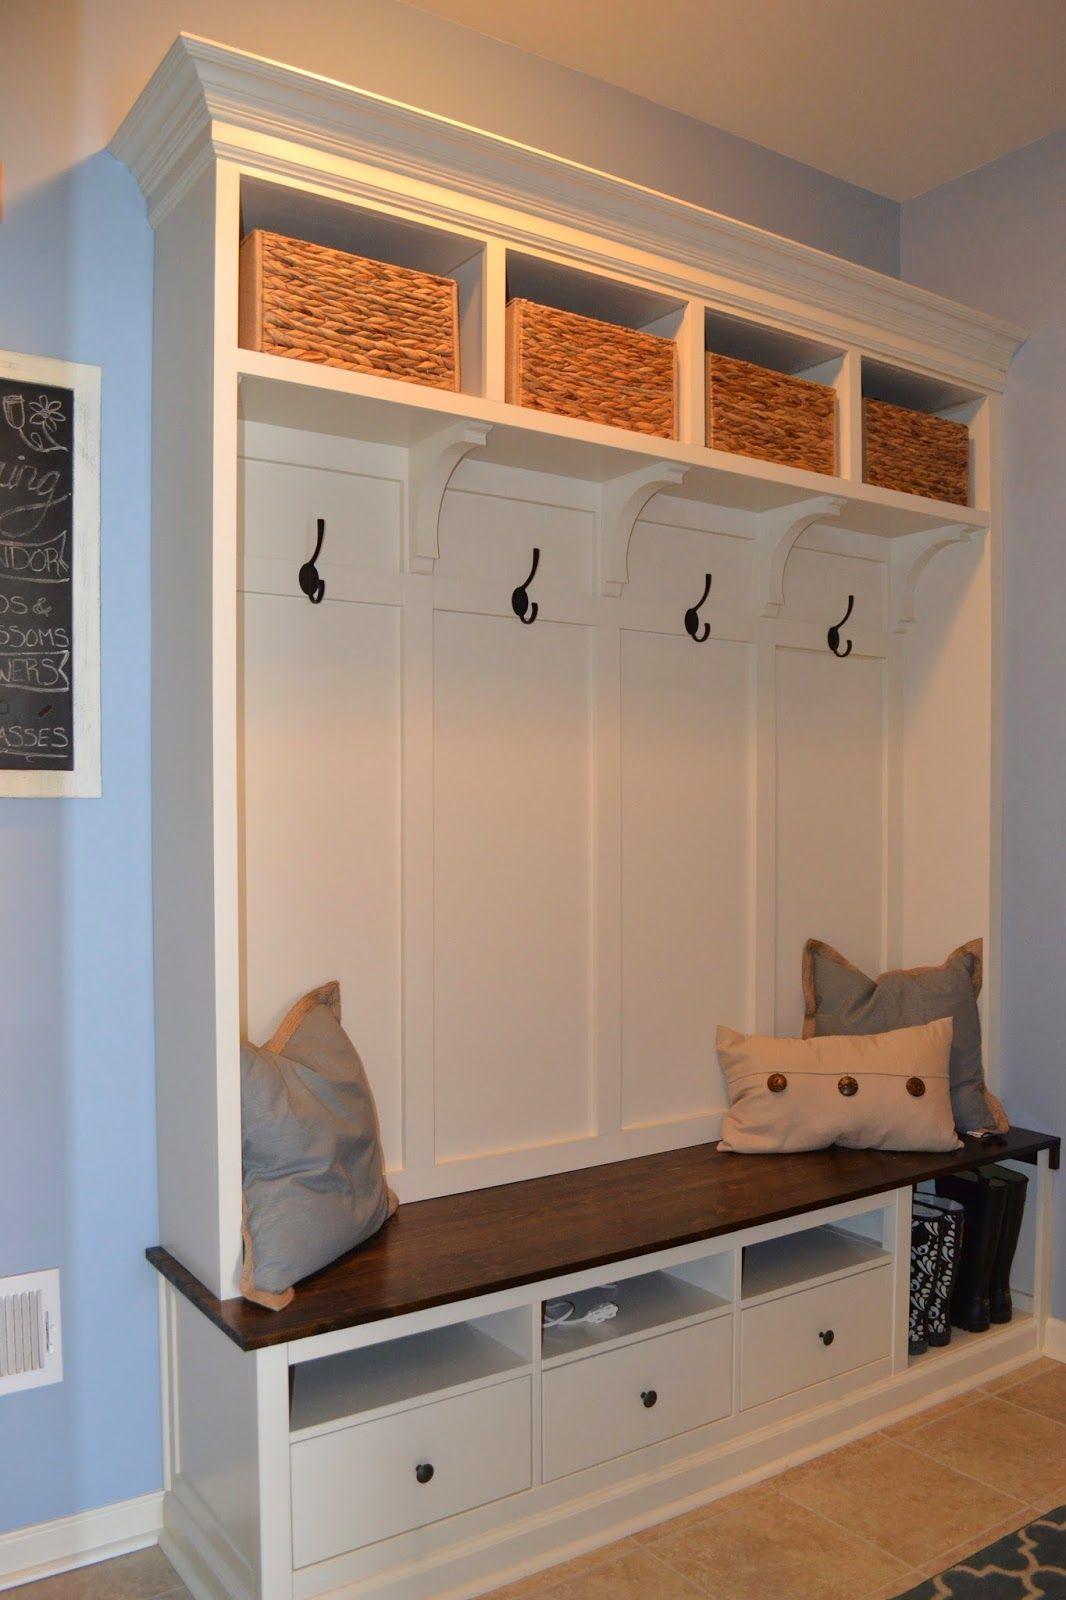 Home Design Plan 10x8m 3 Bedrooms With Interior Design 07